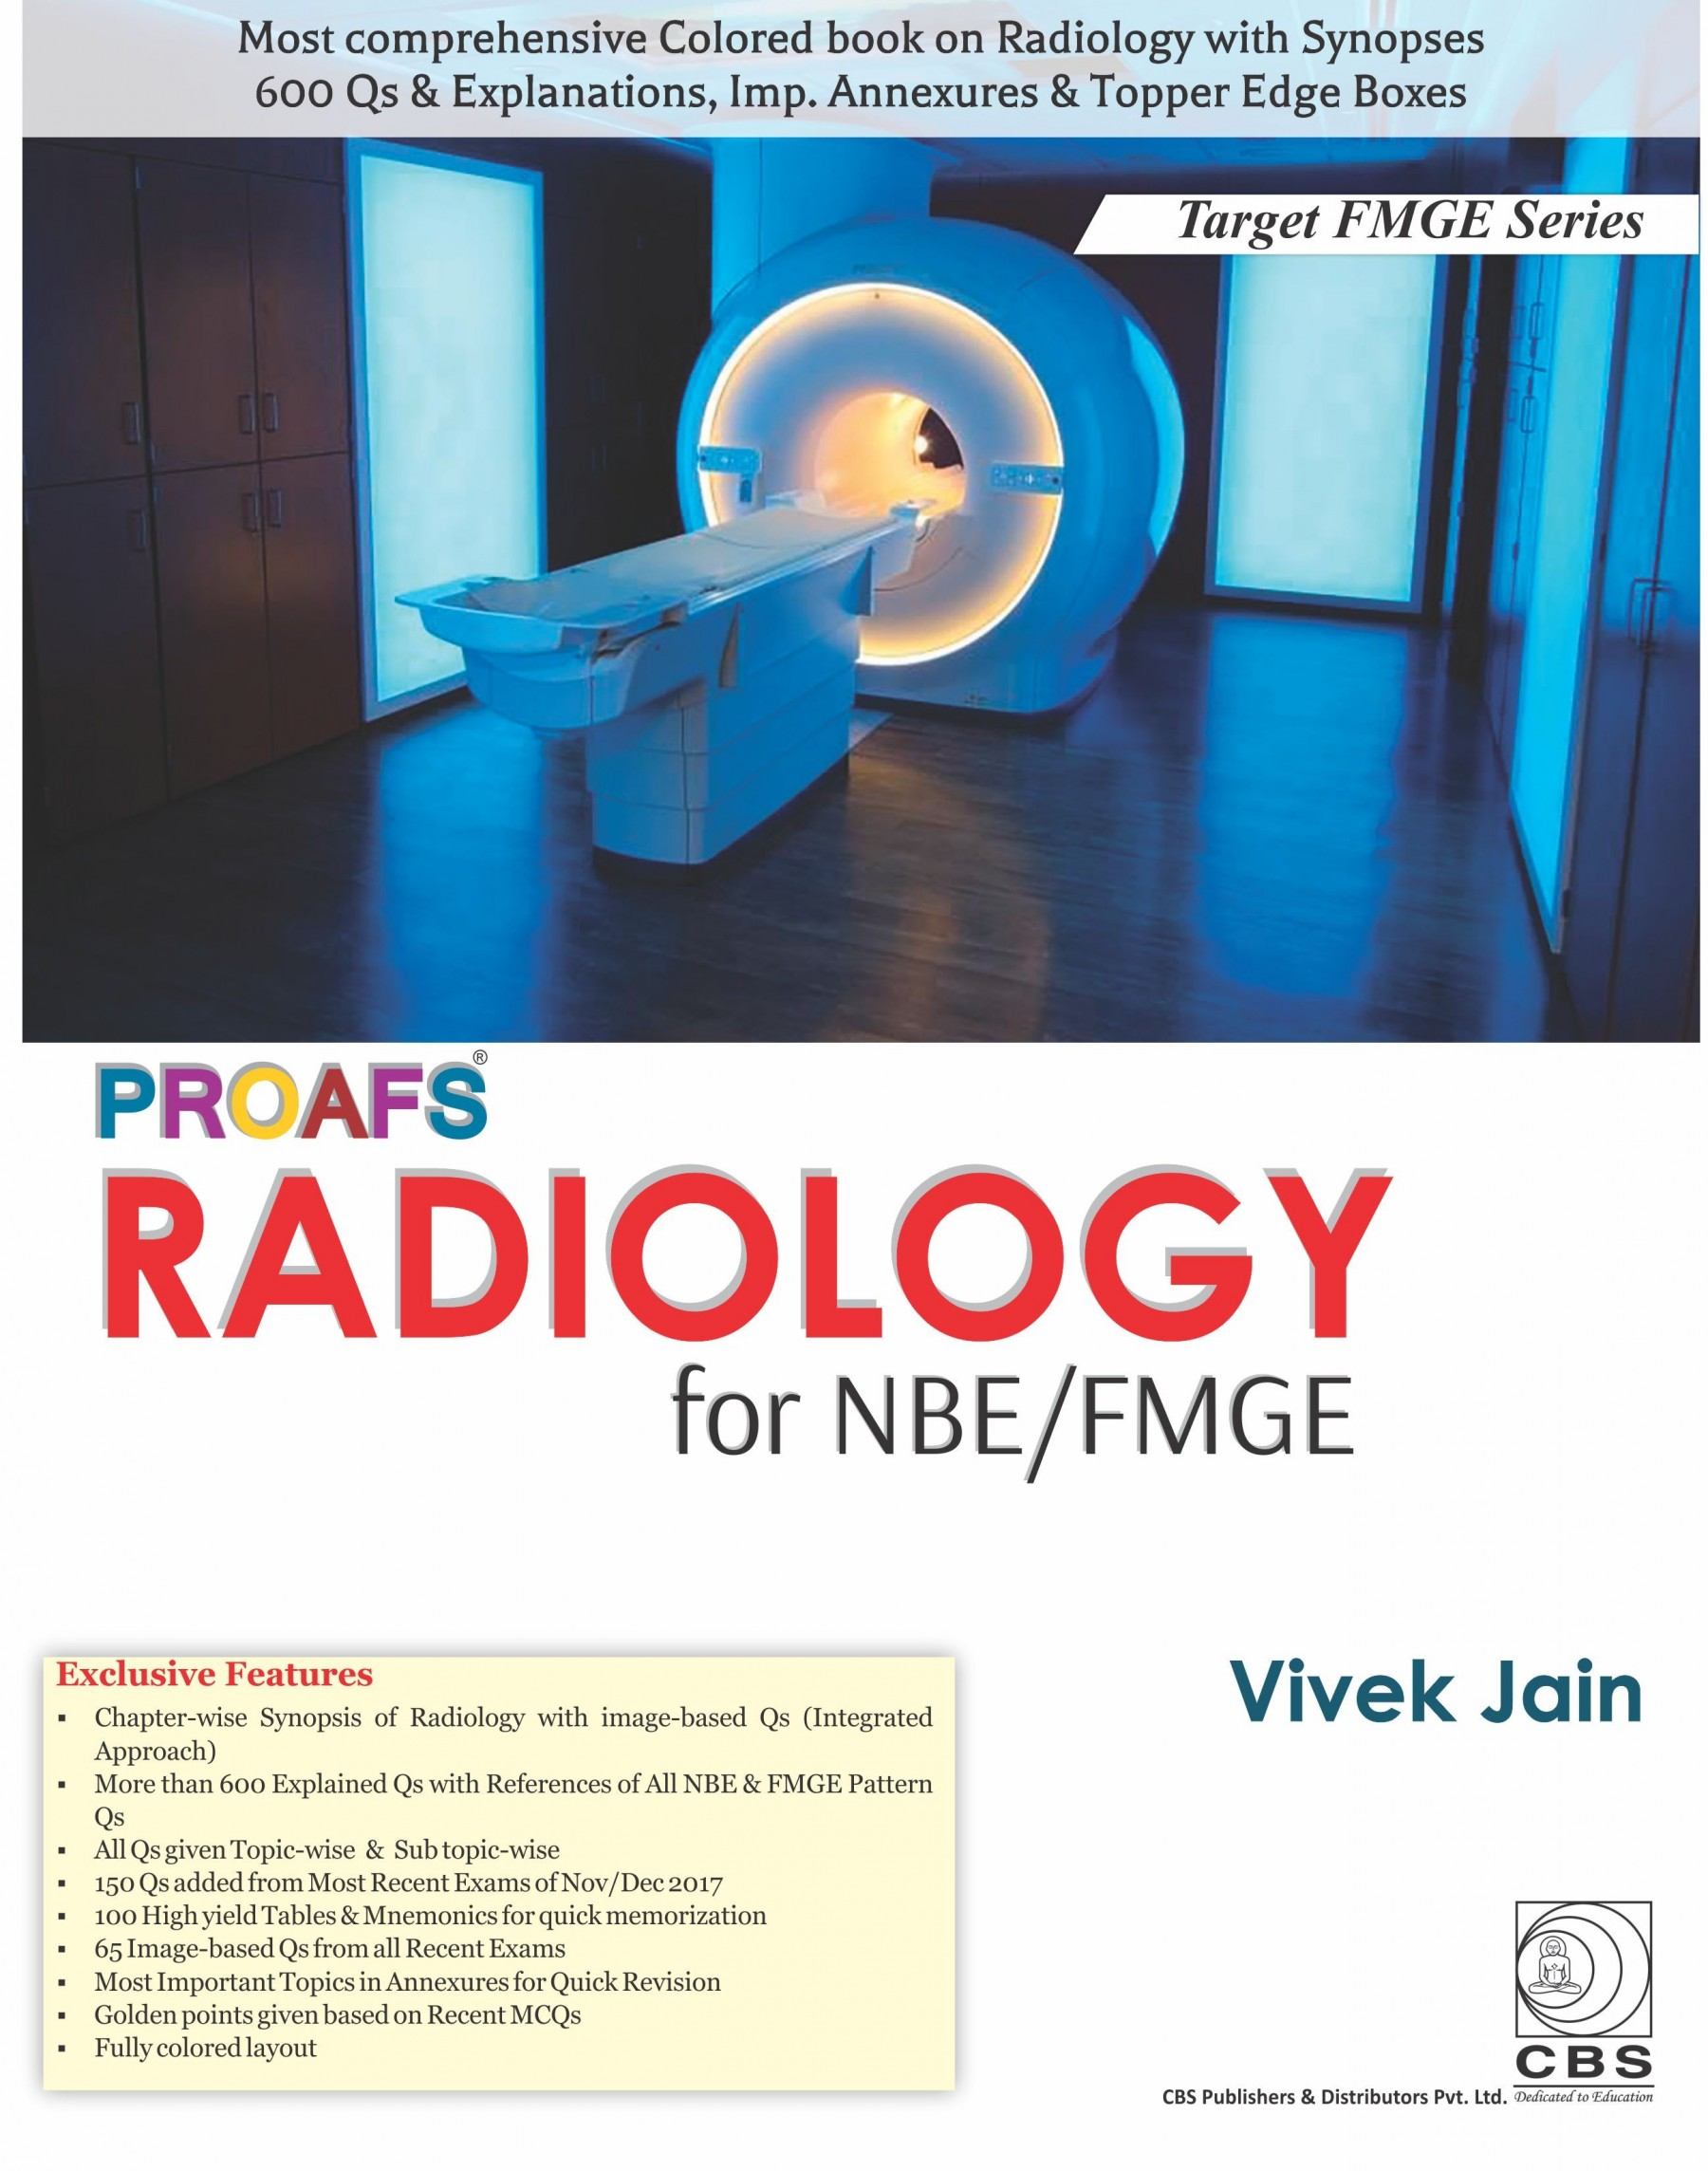 PROAFS RADIOLOGY FOR NBE FMGE (PB 2018) (TARGET FMGE SERIES)